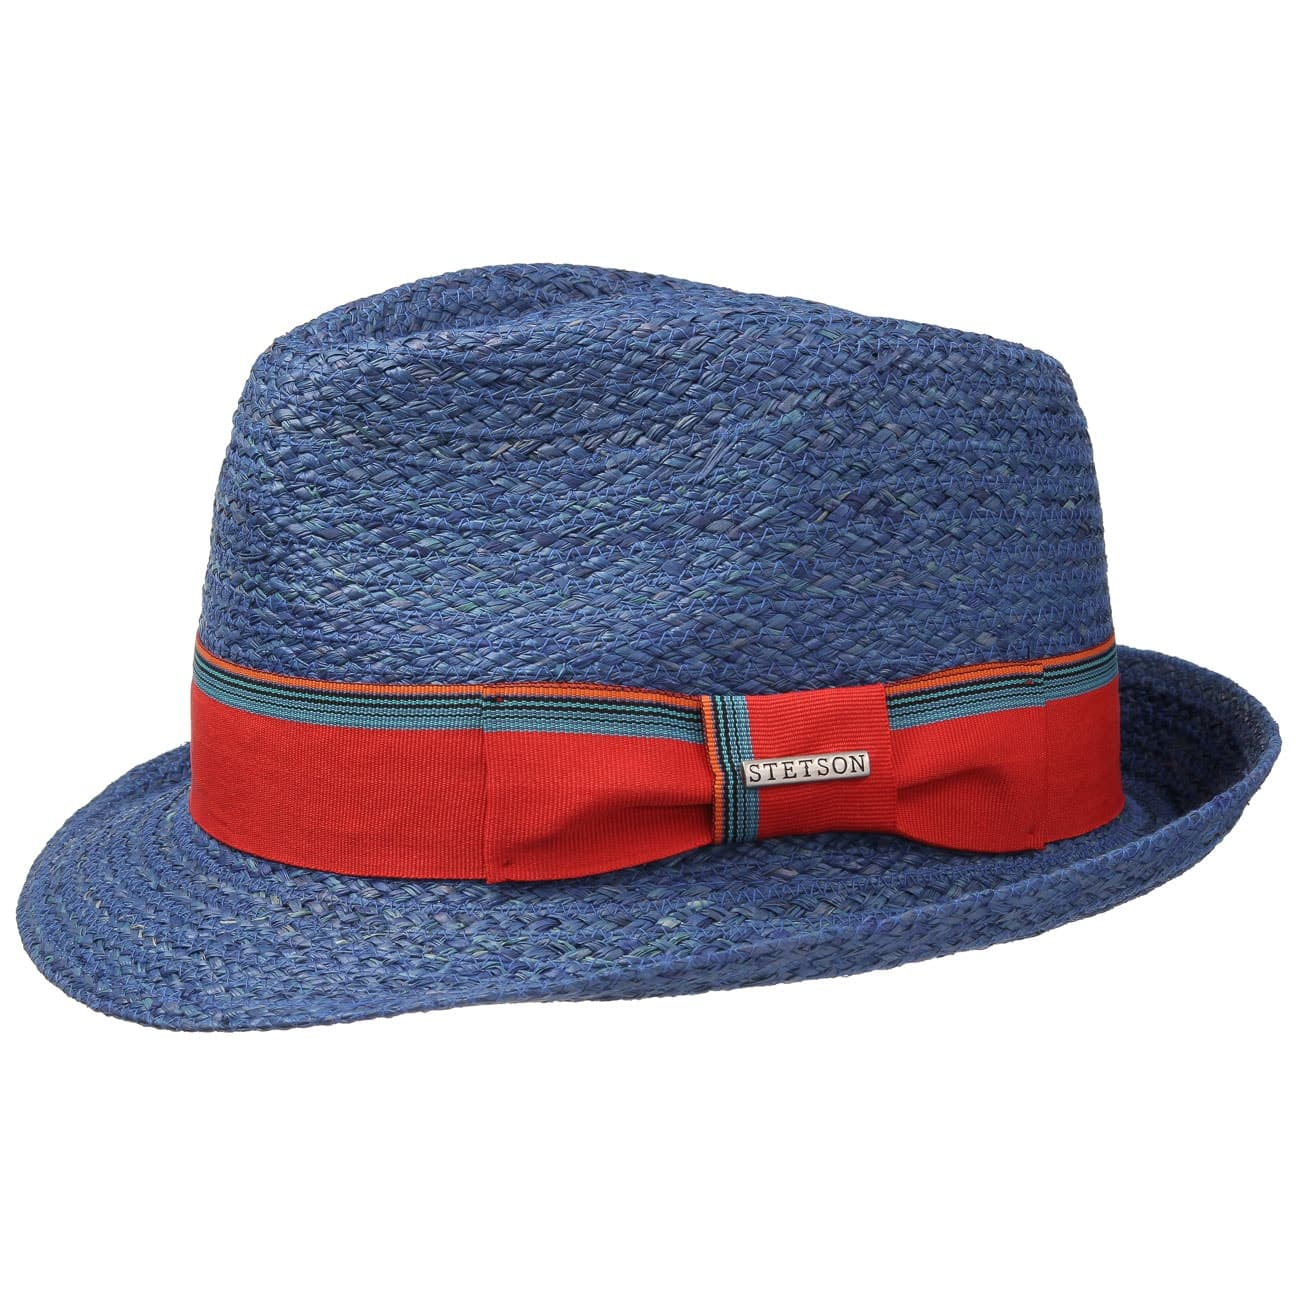 016f895c0da ... Sidney Raffia Straw Trilby Hat by Stetson - nature 4 ...